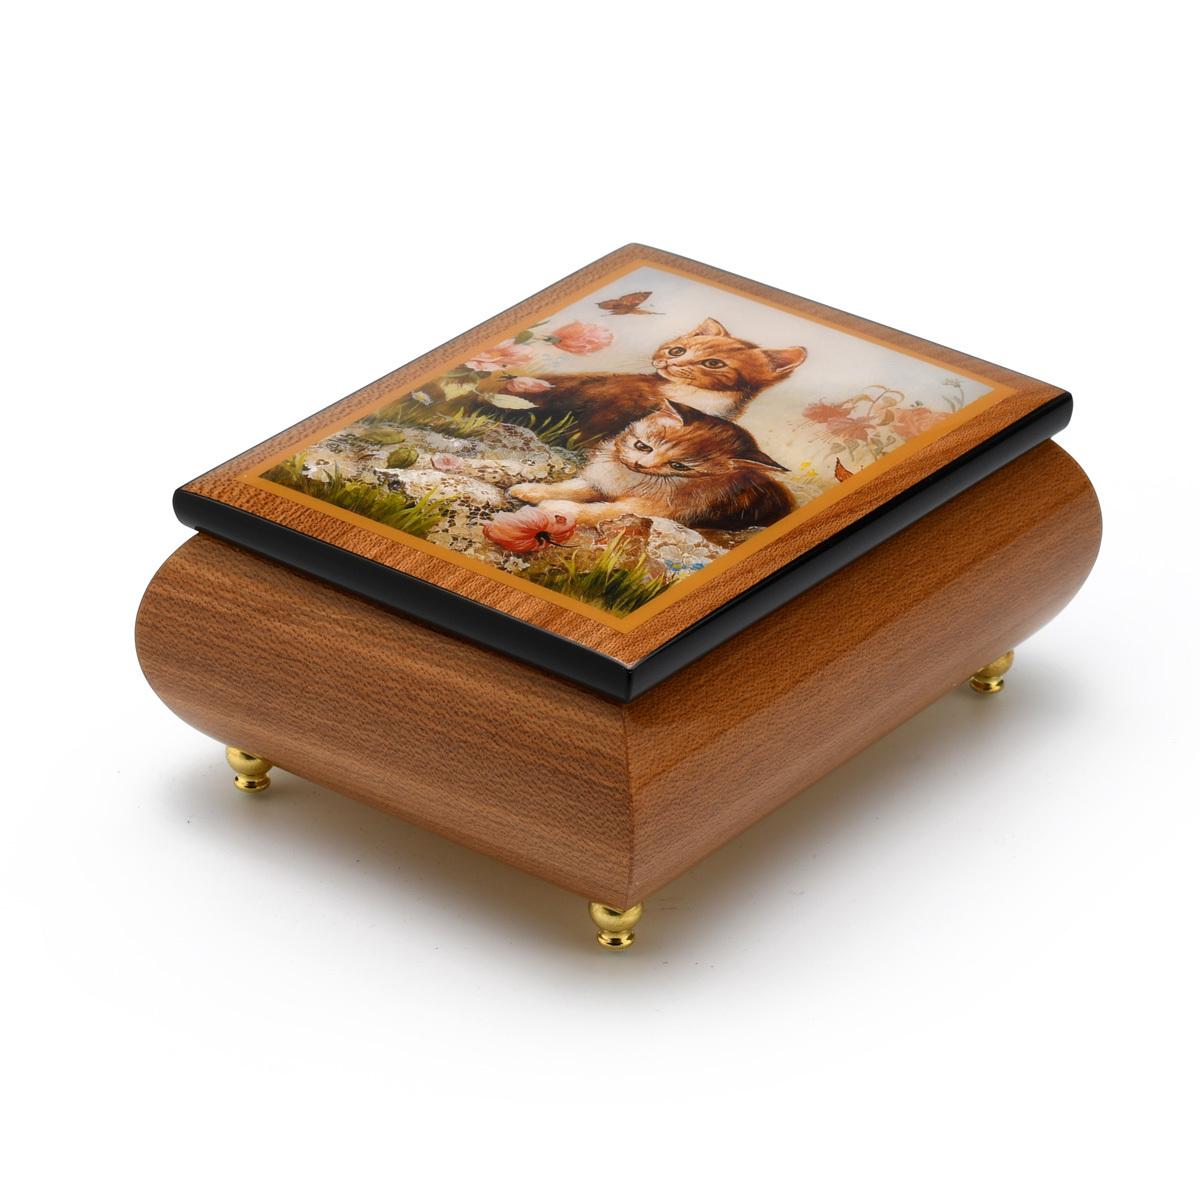 Playful Natural Wood Tone Ercolano Music Jewelry Box - Kitten Frolic by Brenda Burke